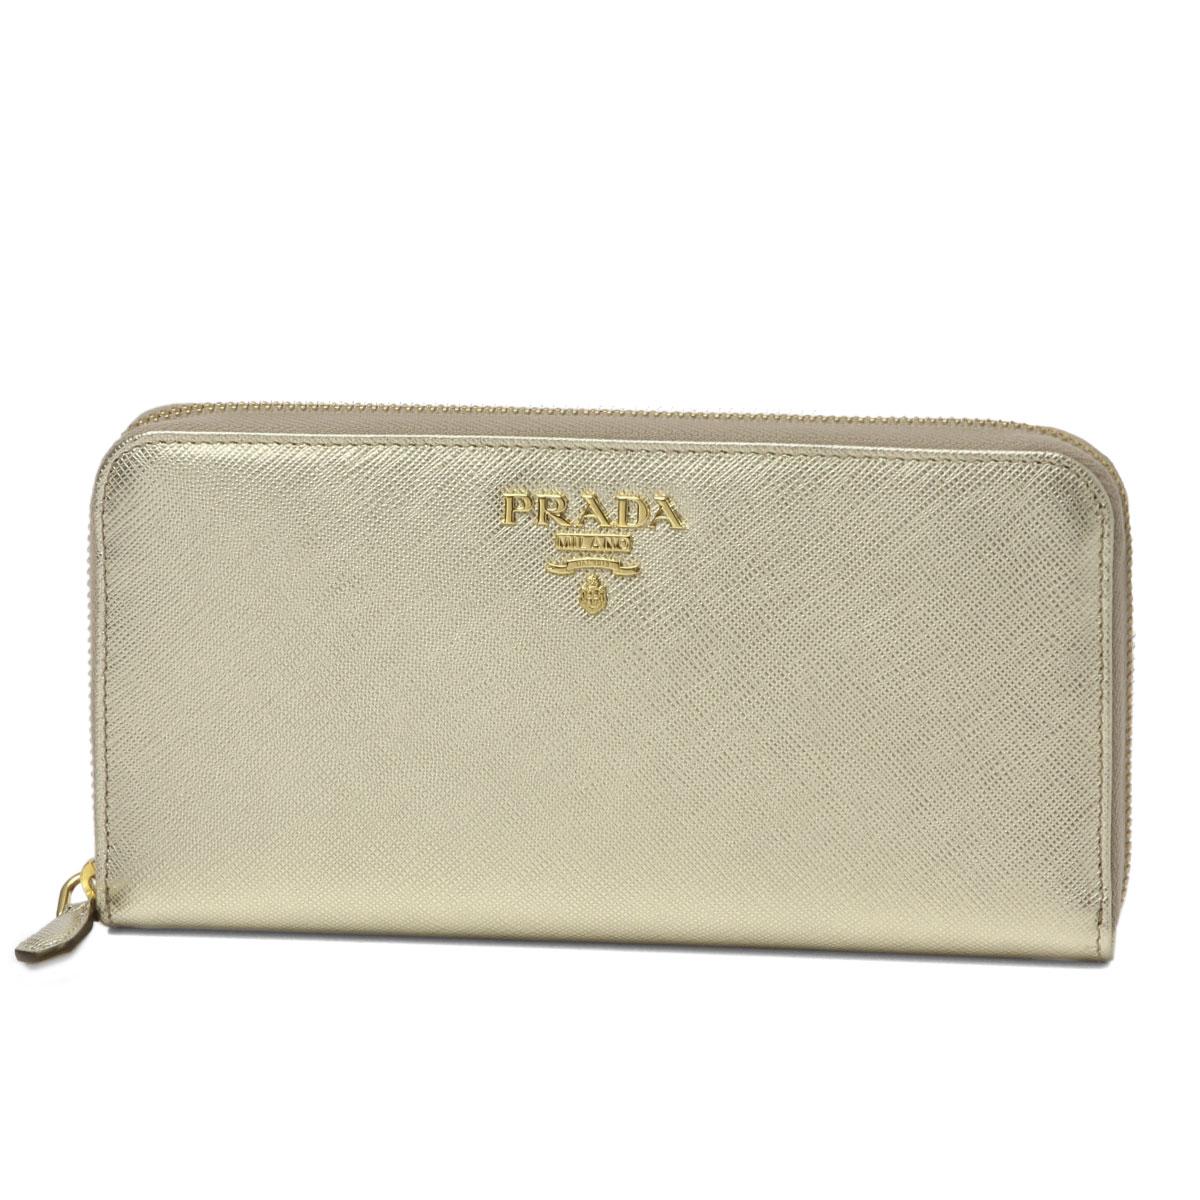 03d76aae0dae ... best price prada prada wallet ladys 1ml506 qwa f0846 round fastener  long wallet saffiano metal pirite